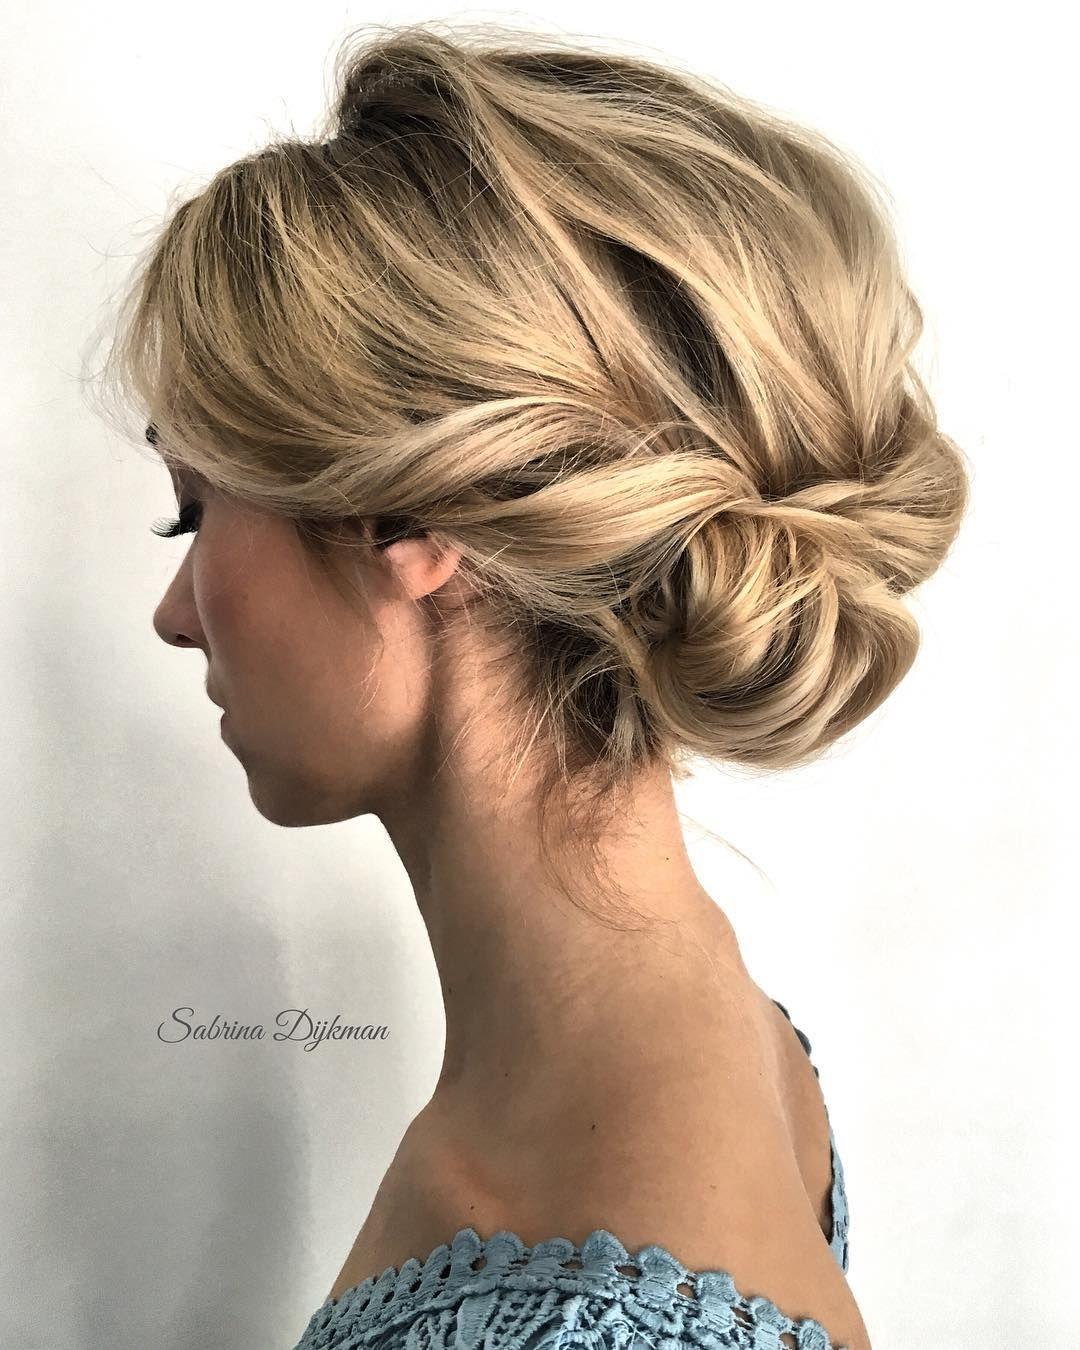 Hairstyle Inspiration : Sabrina Dijkman Hair Artist